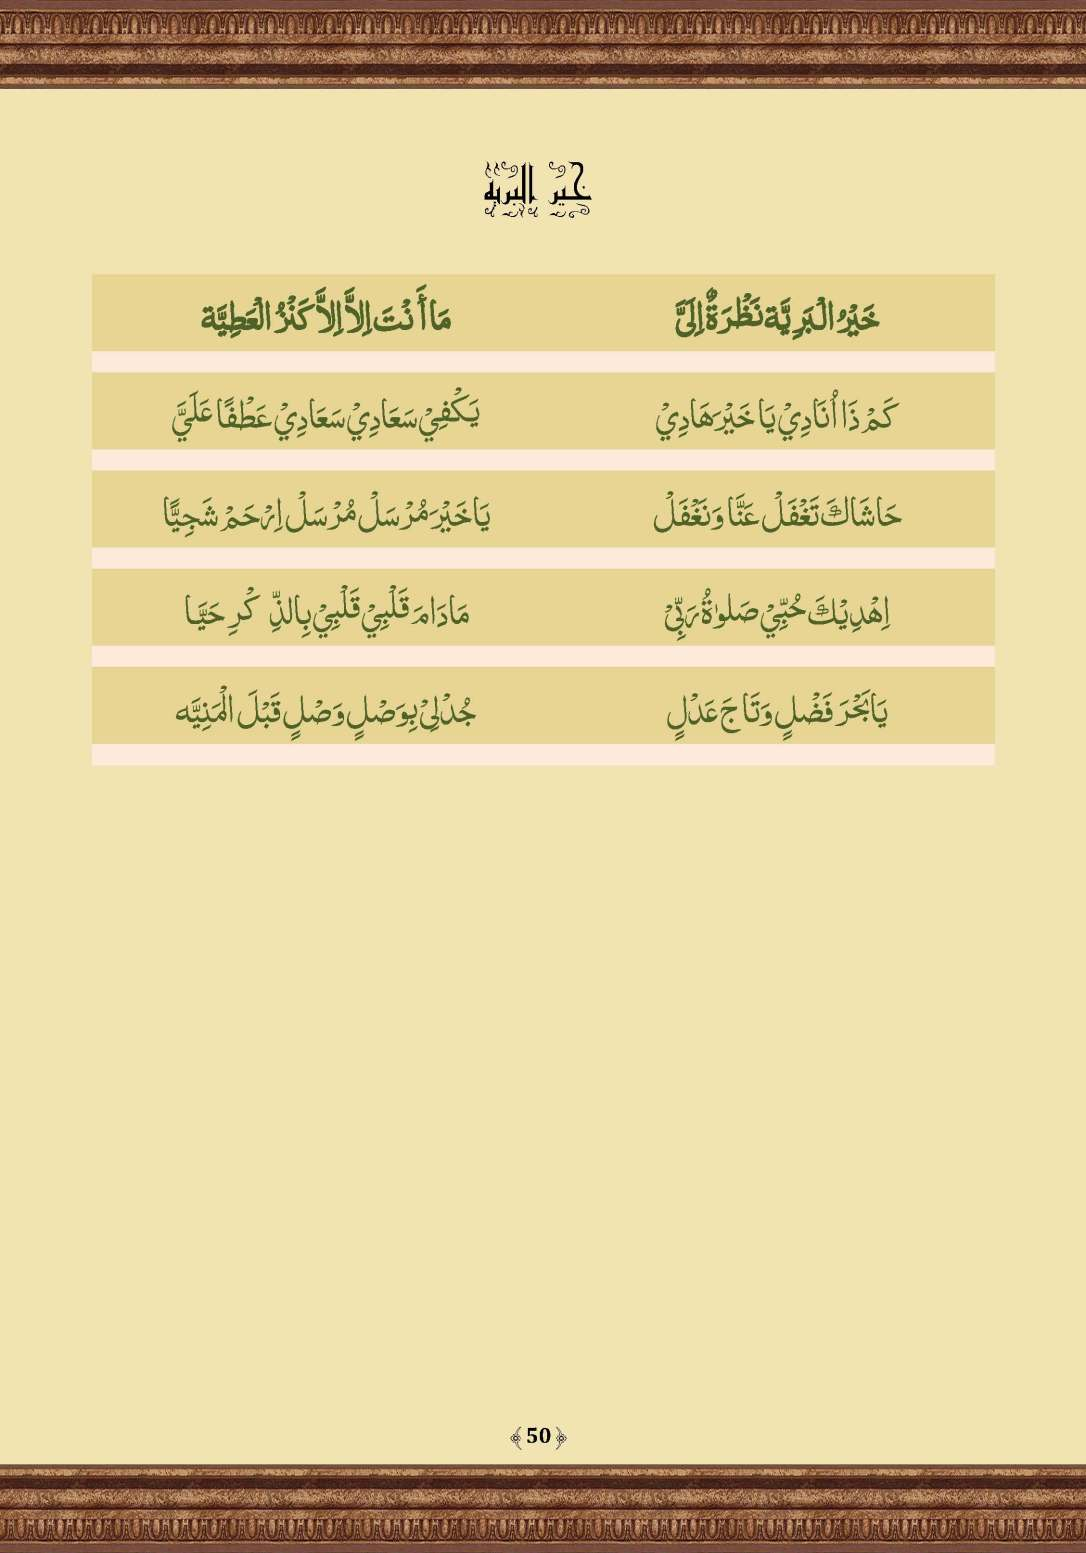 Qasidat_al-Burda_Page_50